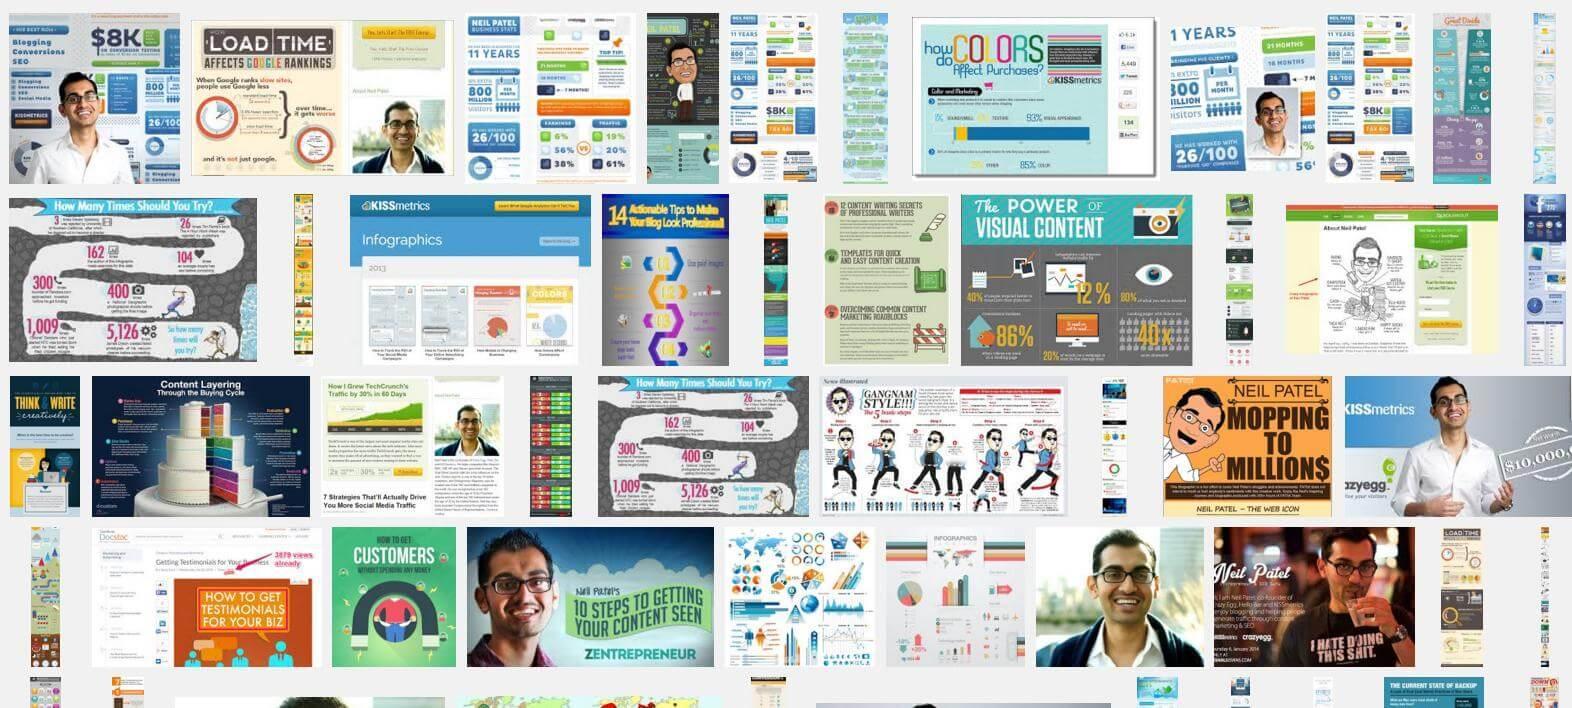 neil patel infographics - Google Search 2015-11-17 07-54-54.jpg